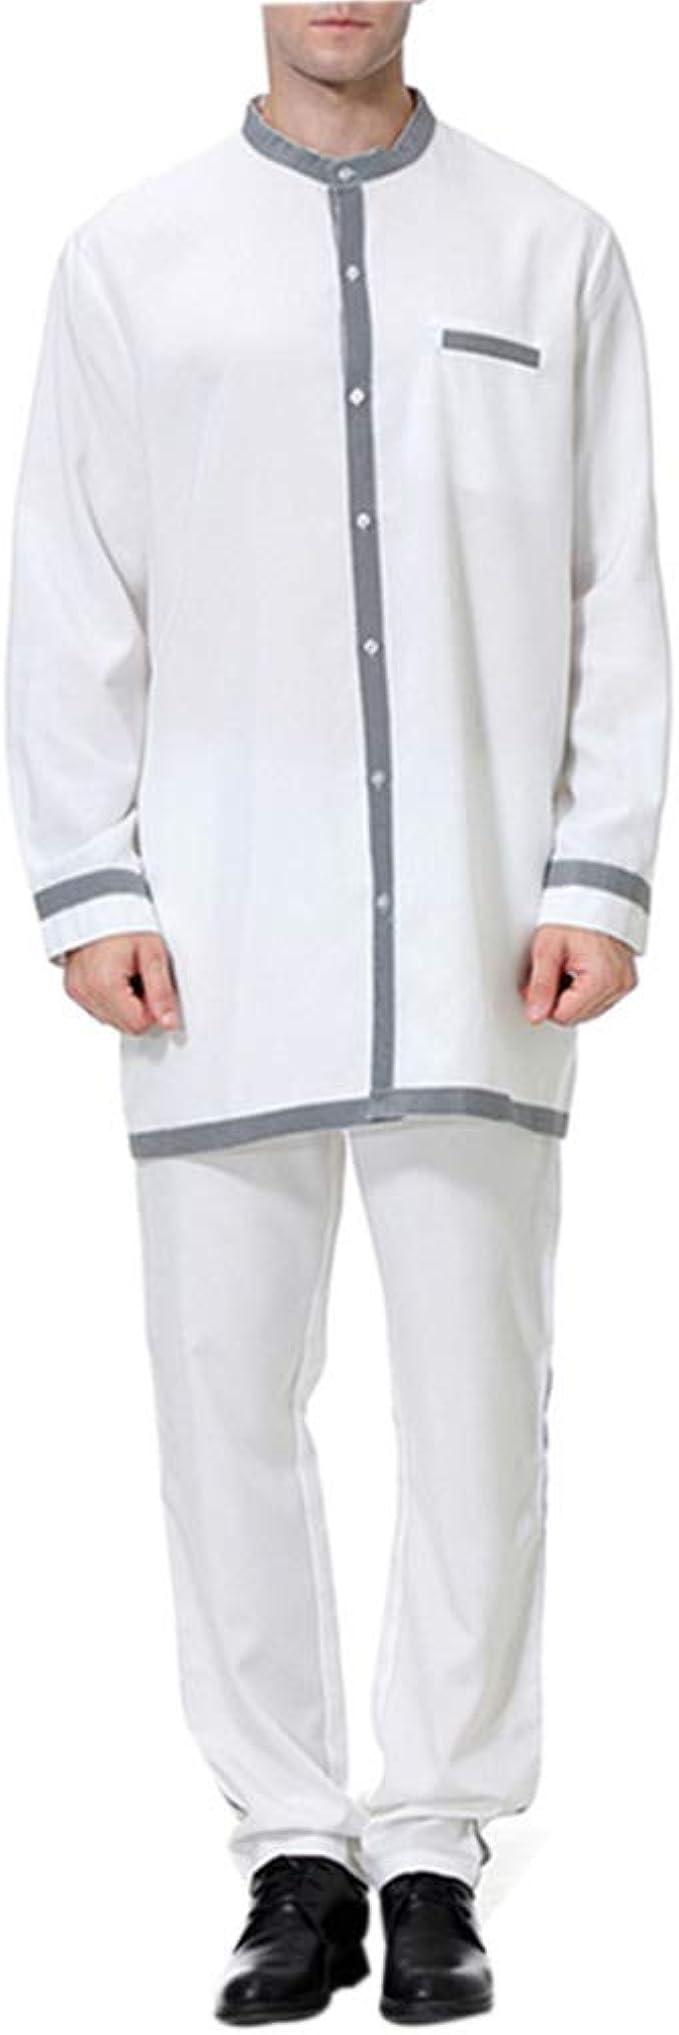 Ropa Musulmán Vestido Abaya Hombre - Arabia Saudita Camisas Arabes Islamica Mango Maxi Vestidos Larga